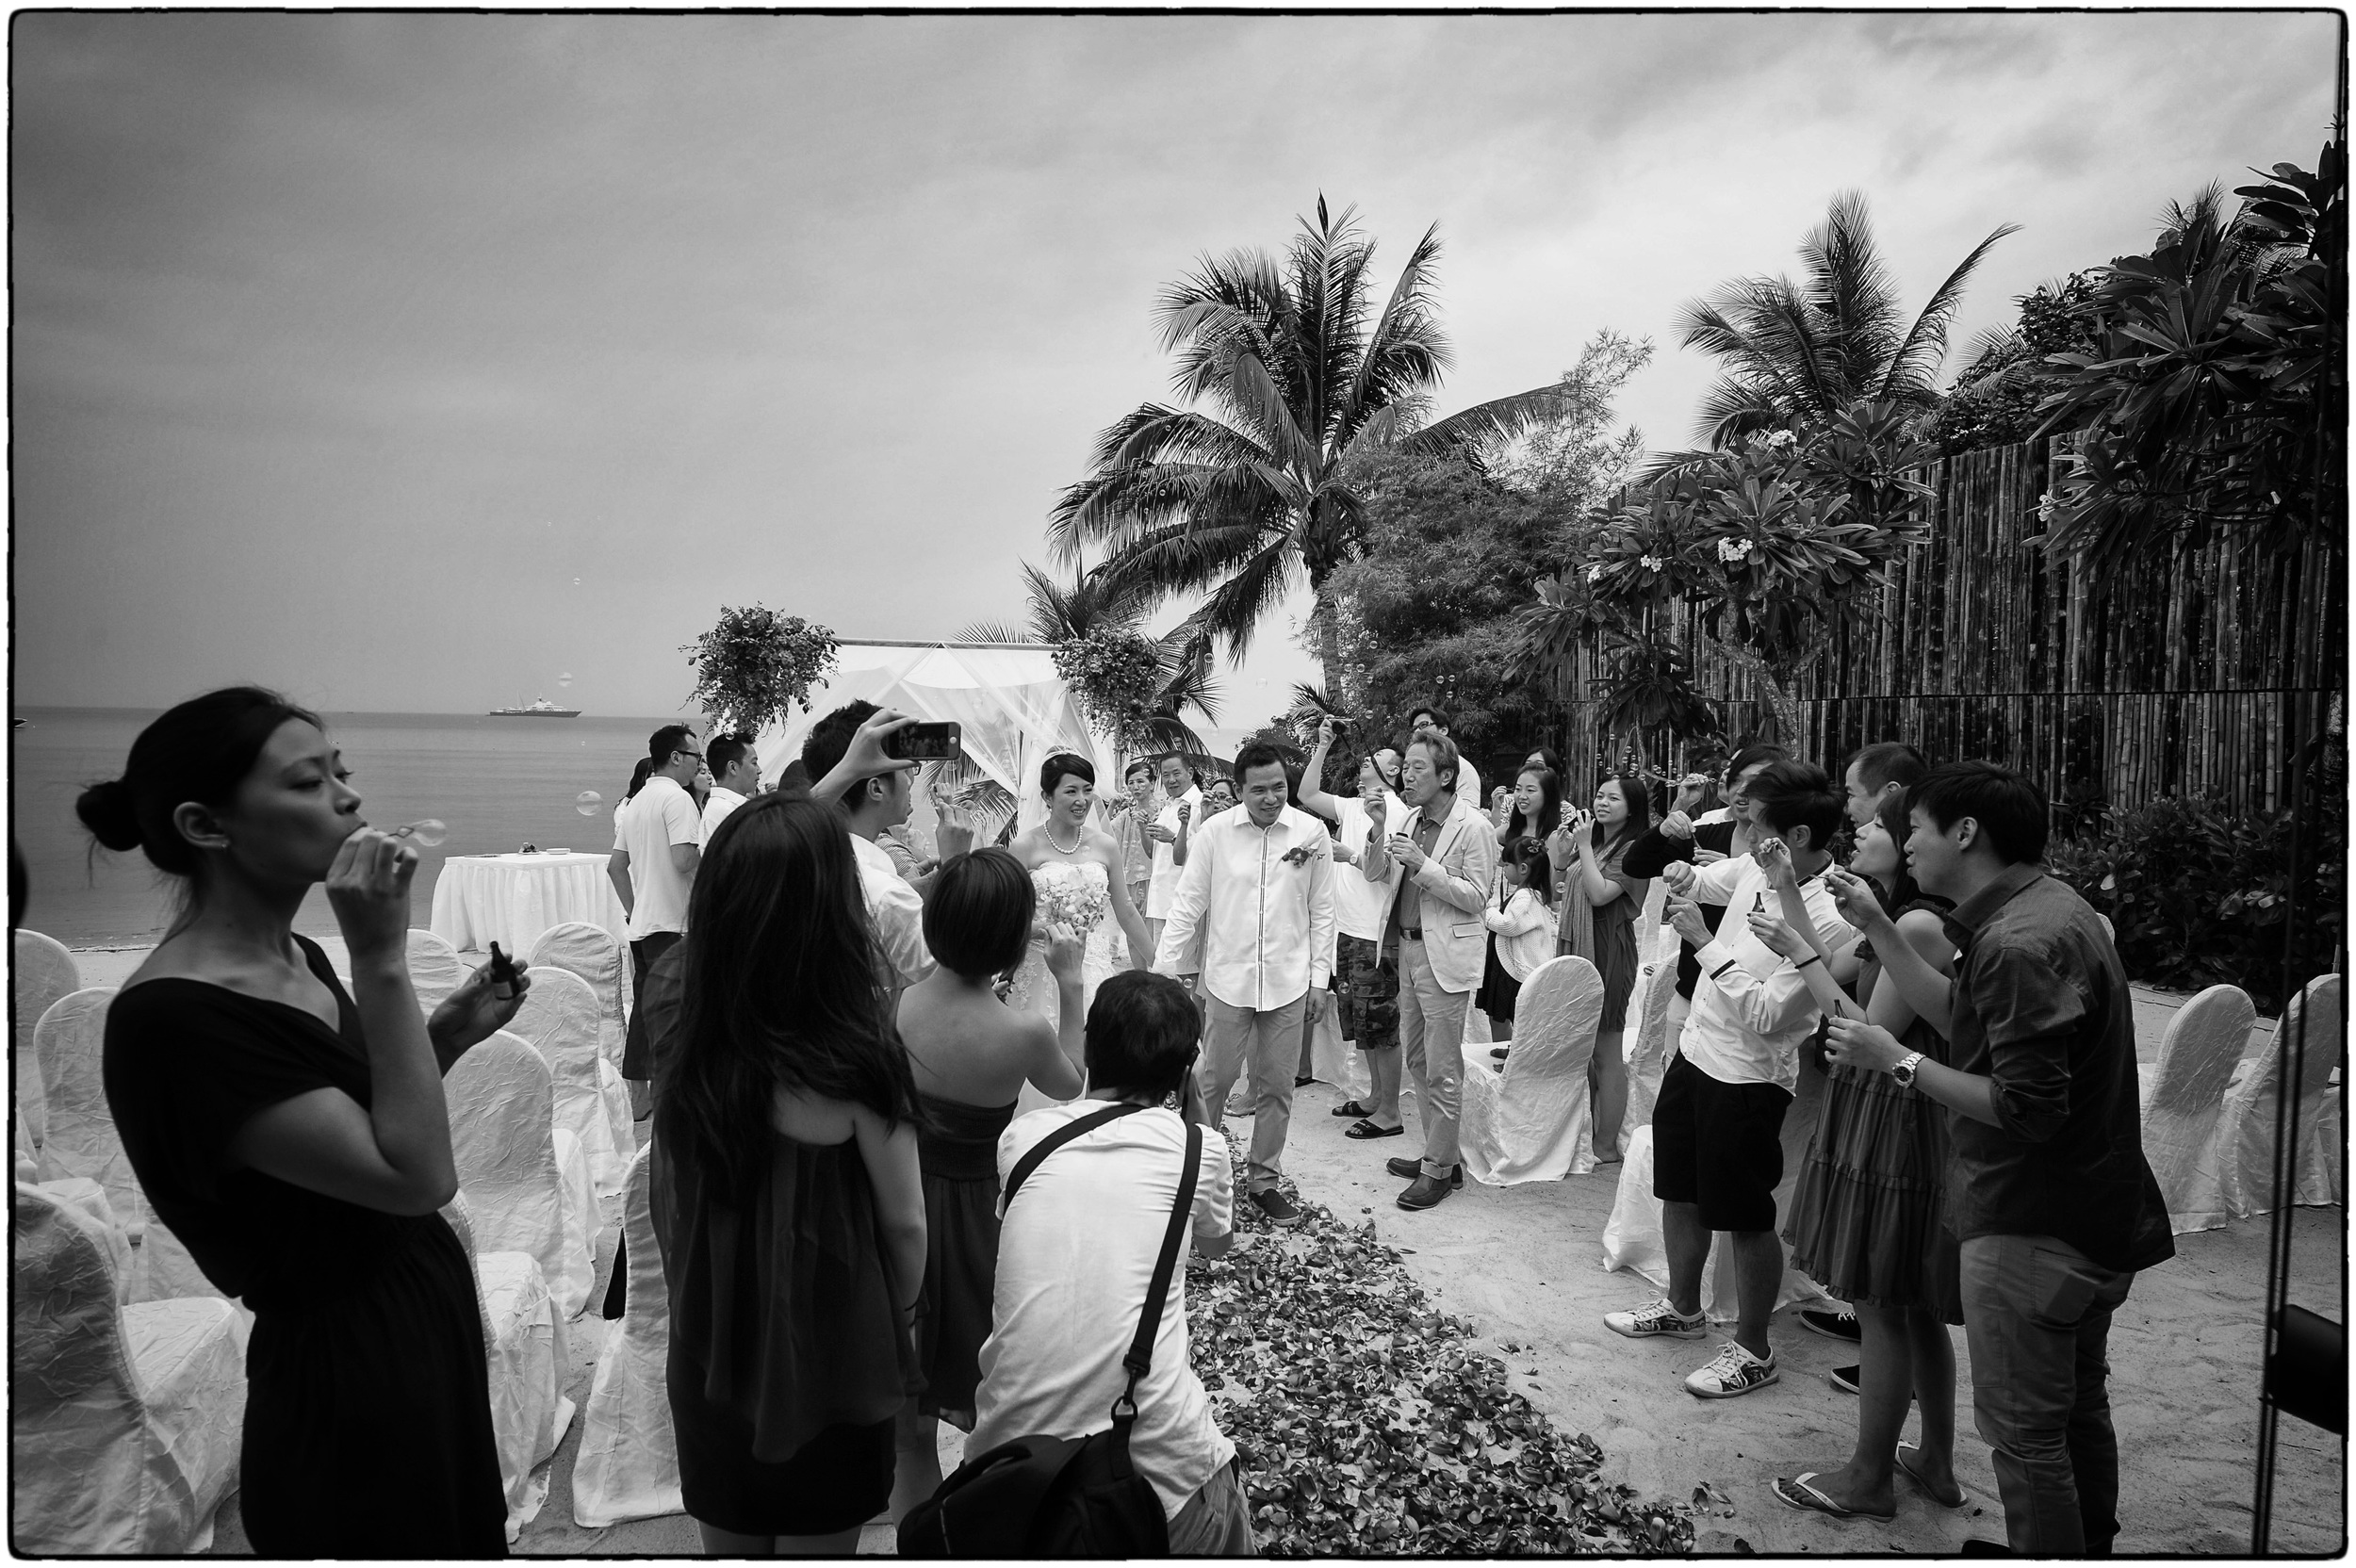 beachwedding02.jpg